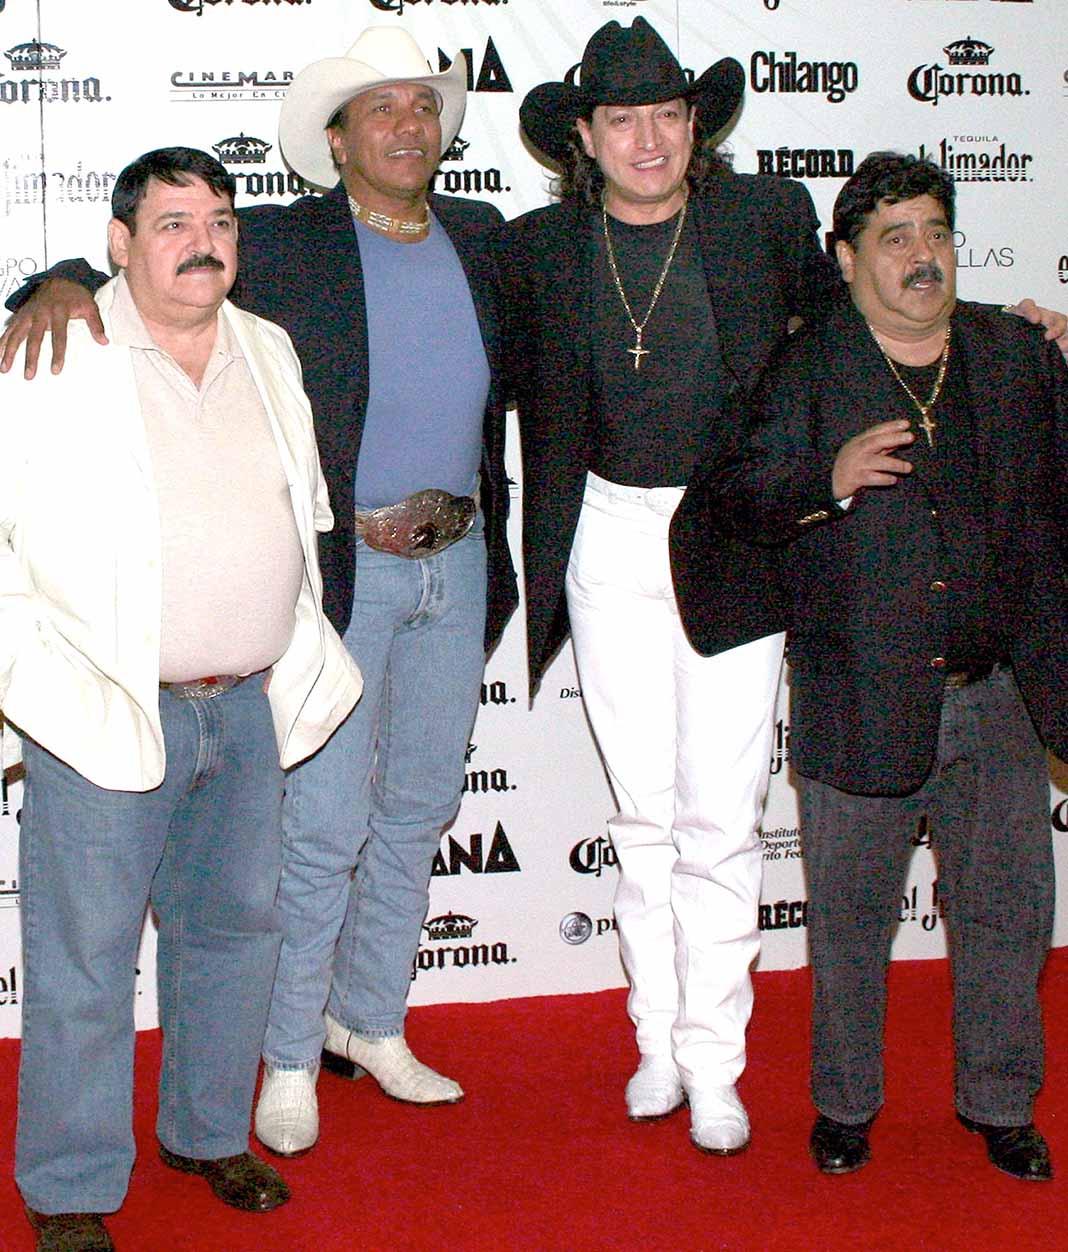 Javier, Lupe, Ramiro y Choche (Q.E.P.D.), integrantes originales del grupo Bronco